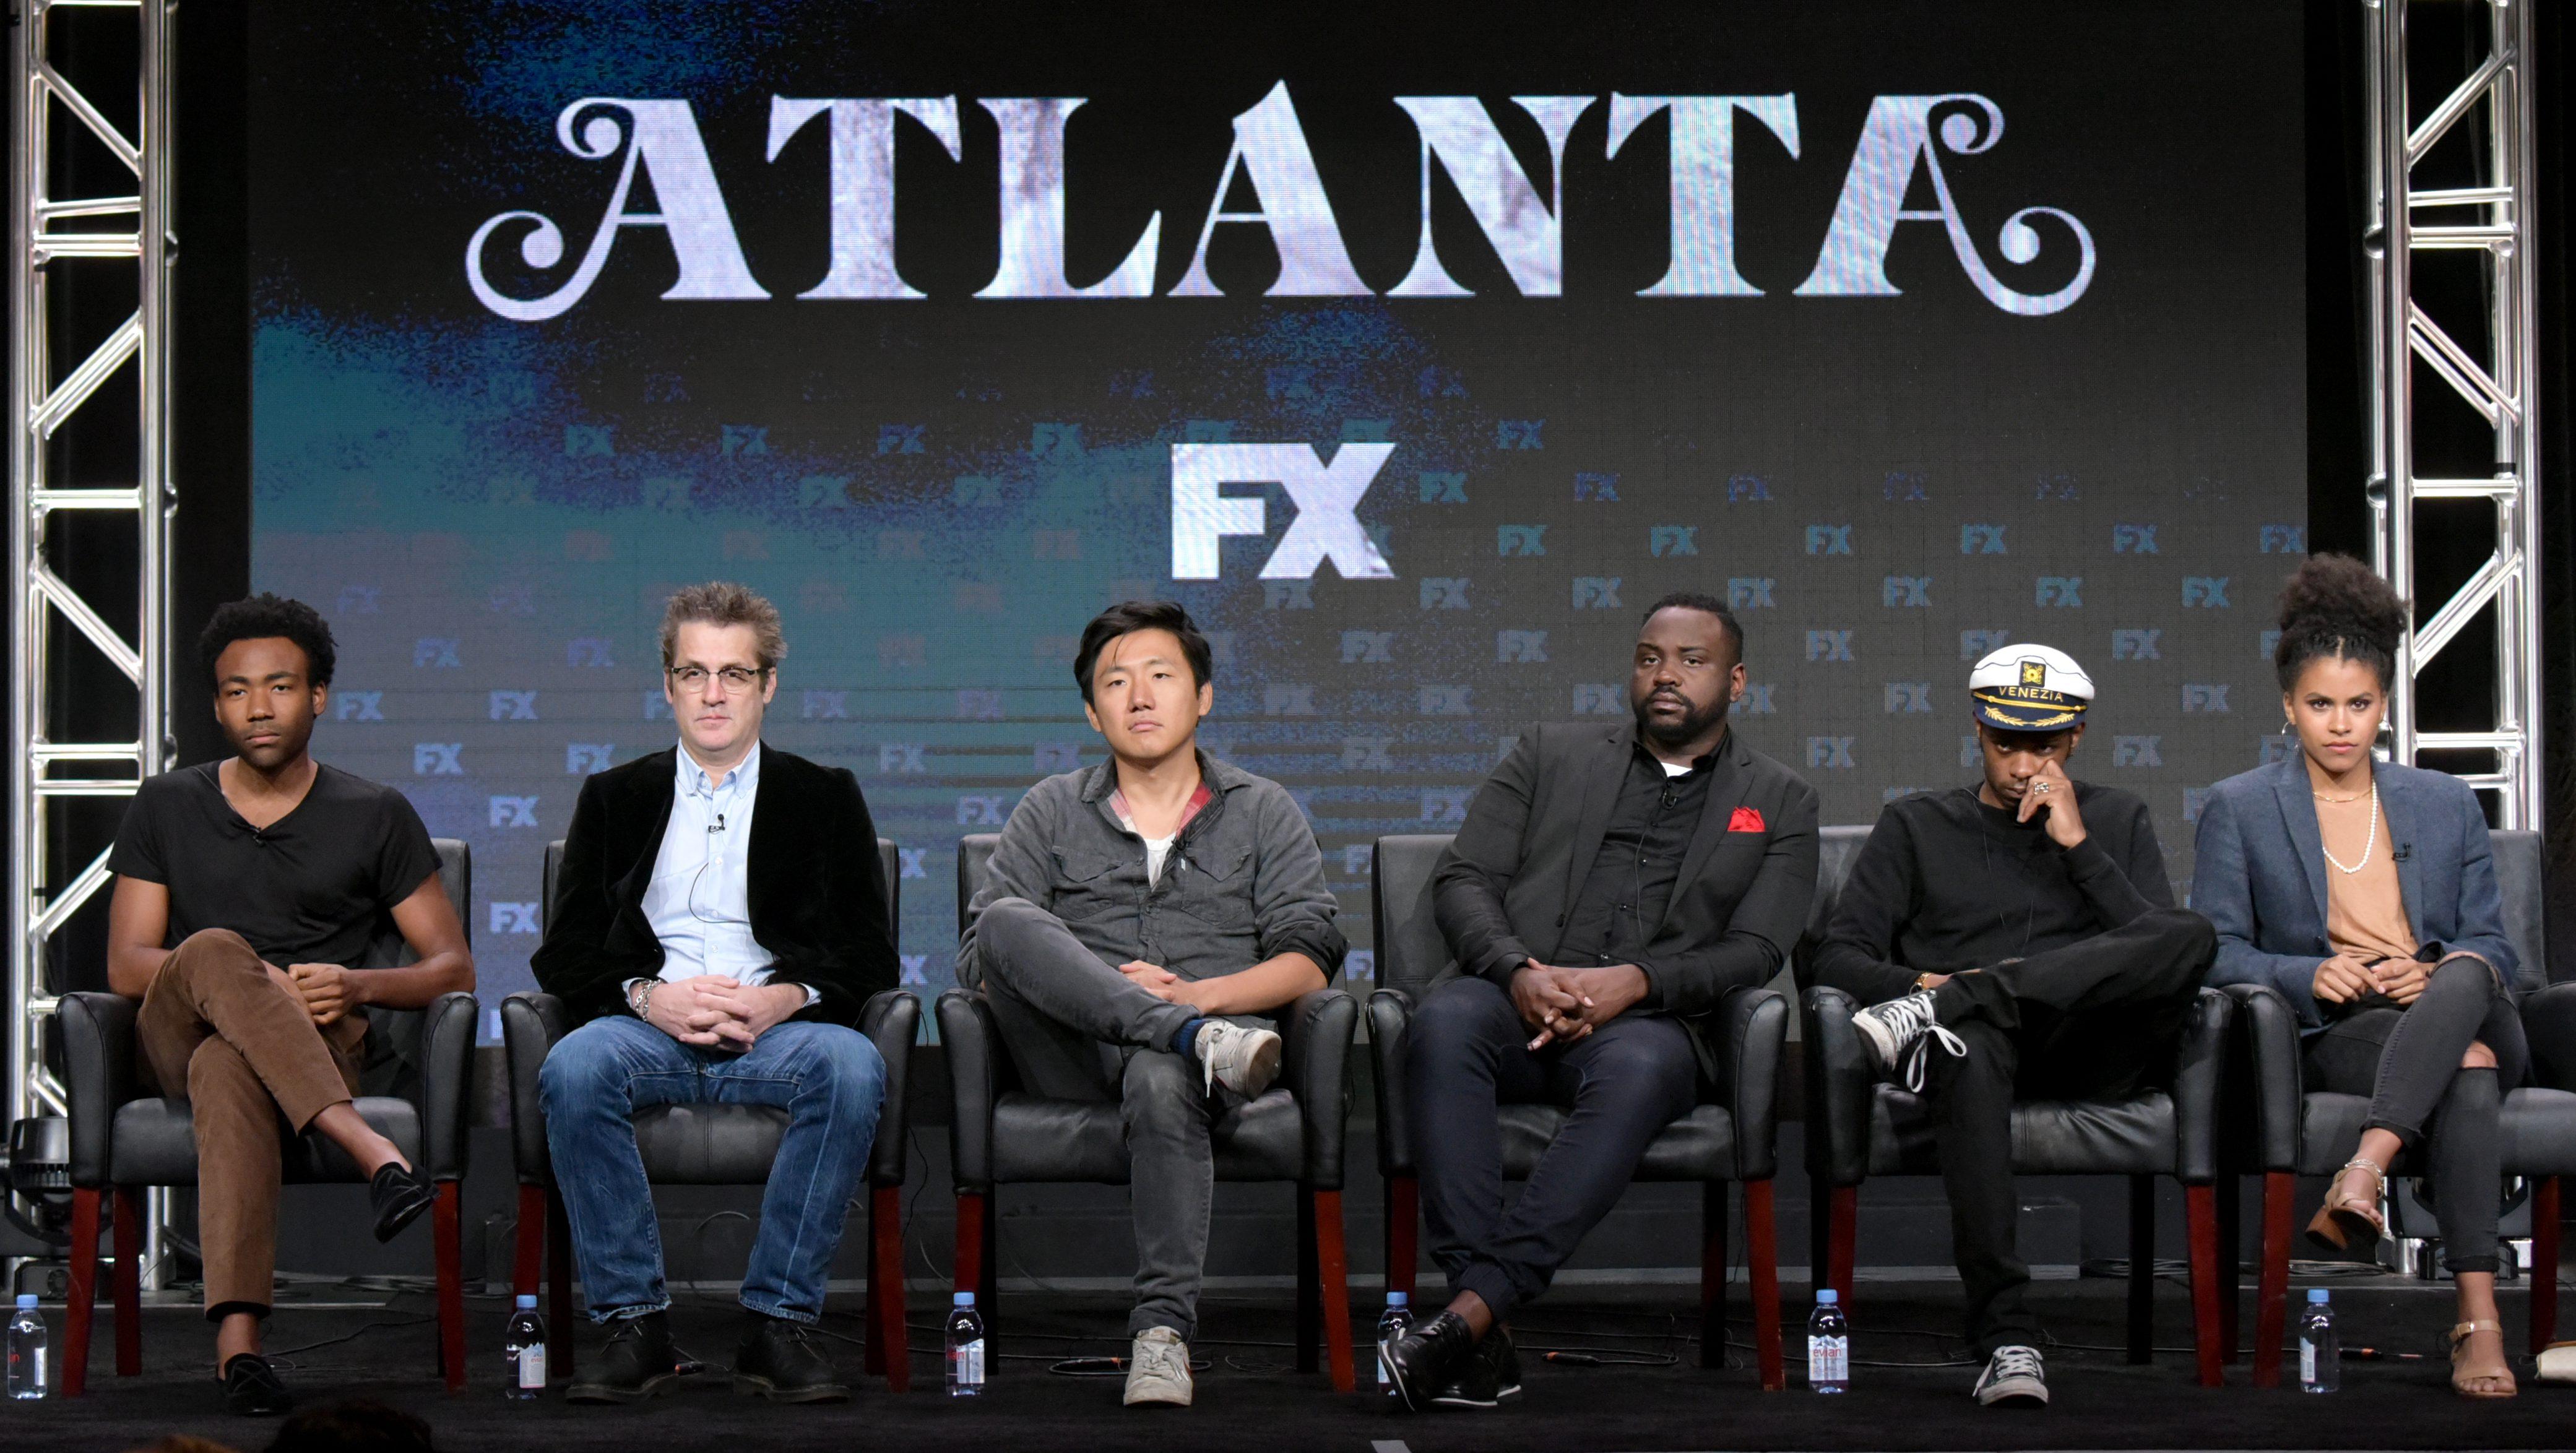 FX Atlanta cast